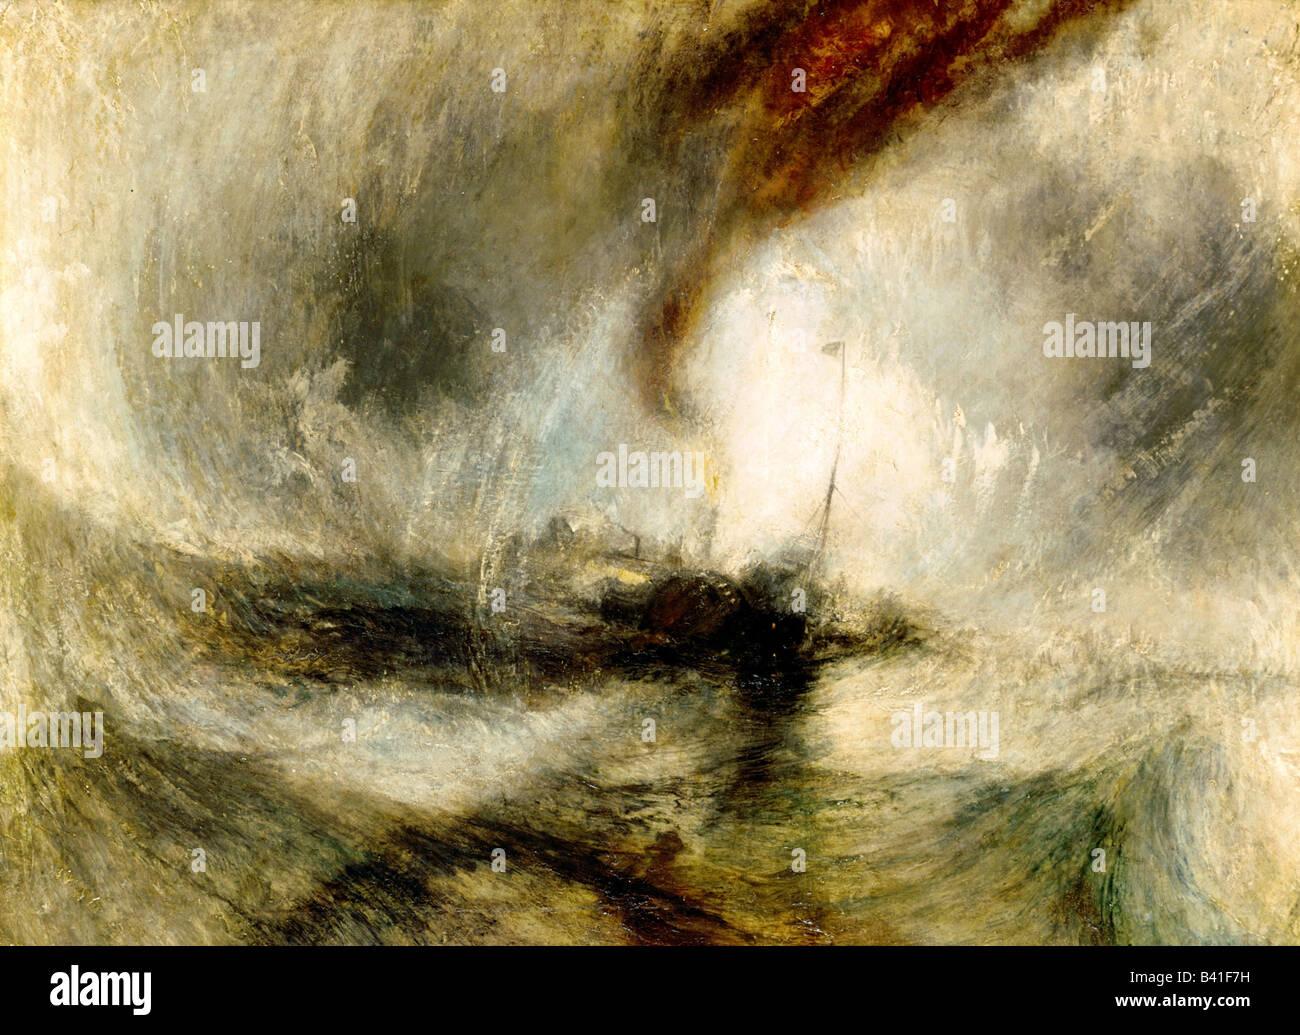 "Bildende Kunst, Turner, Joseph Mallord William (1775-1851), Malerei ""Schneesturm"", 1842, Öl auf Leinwand, Stockbild"